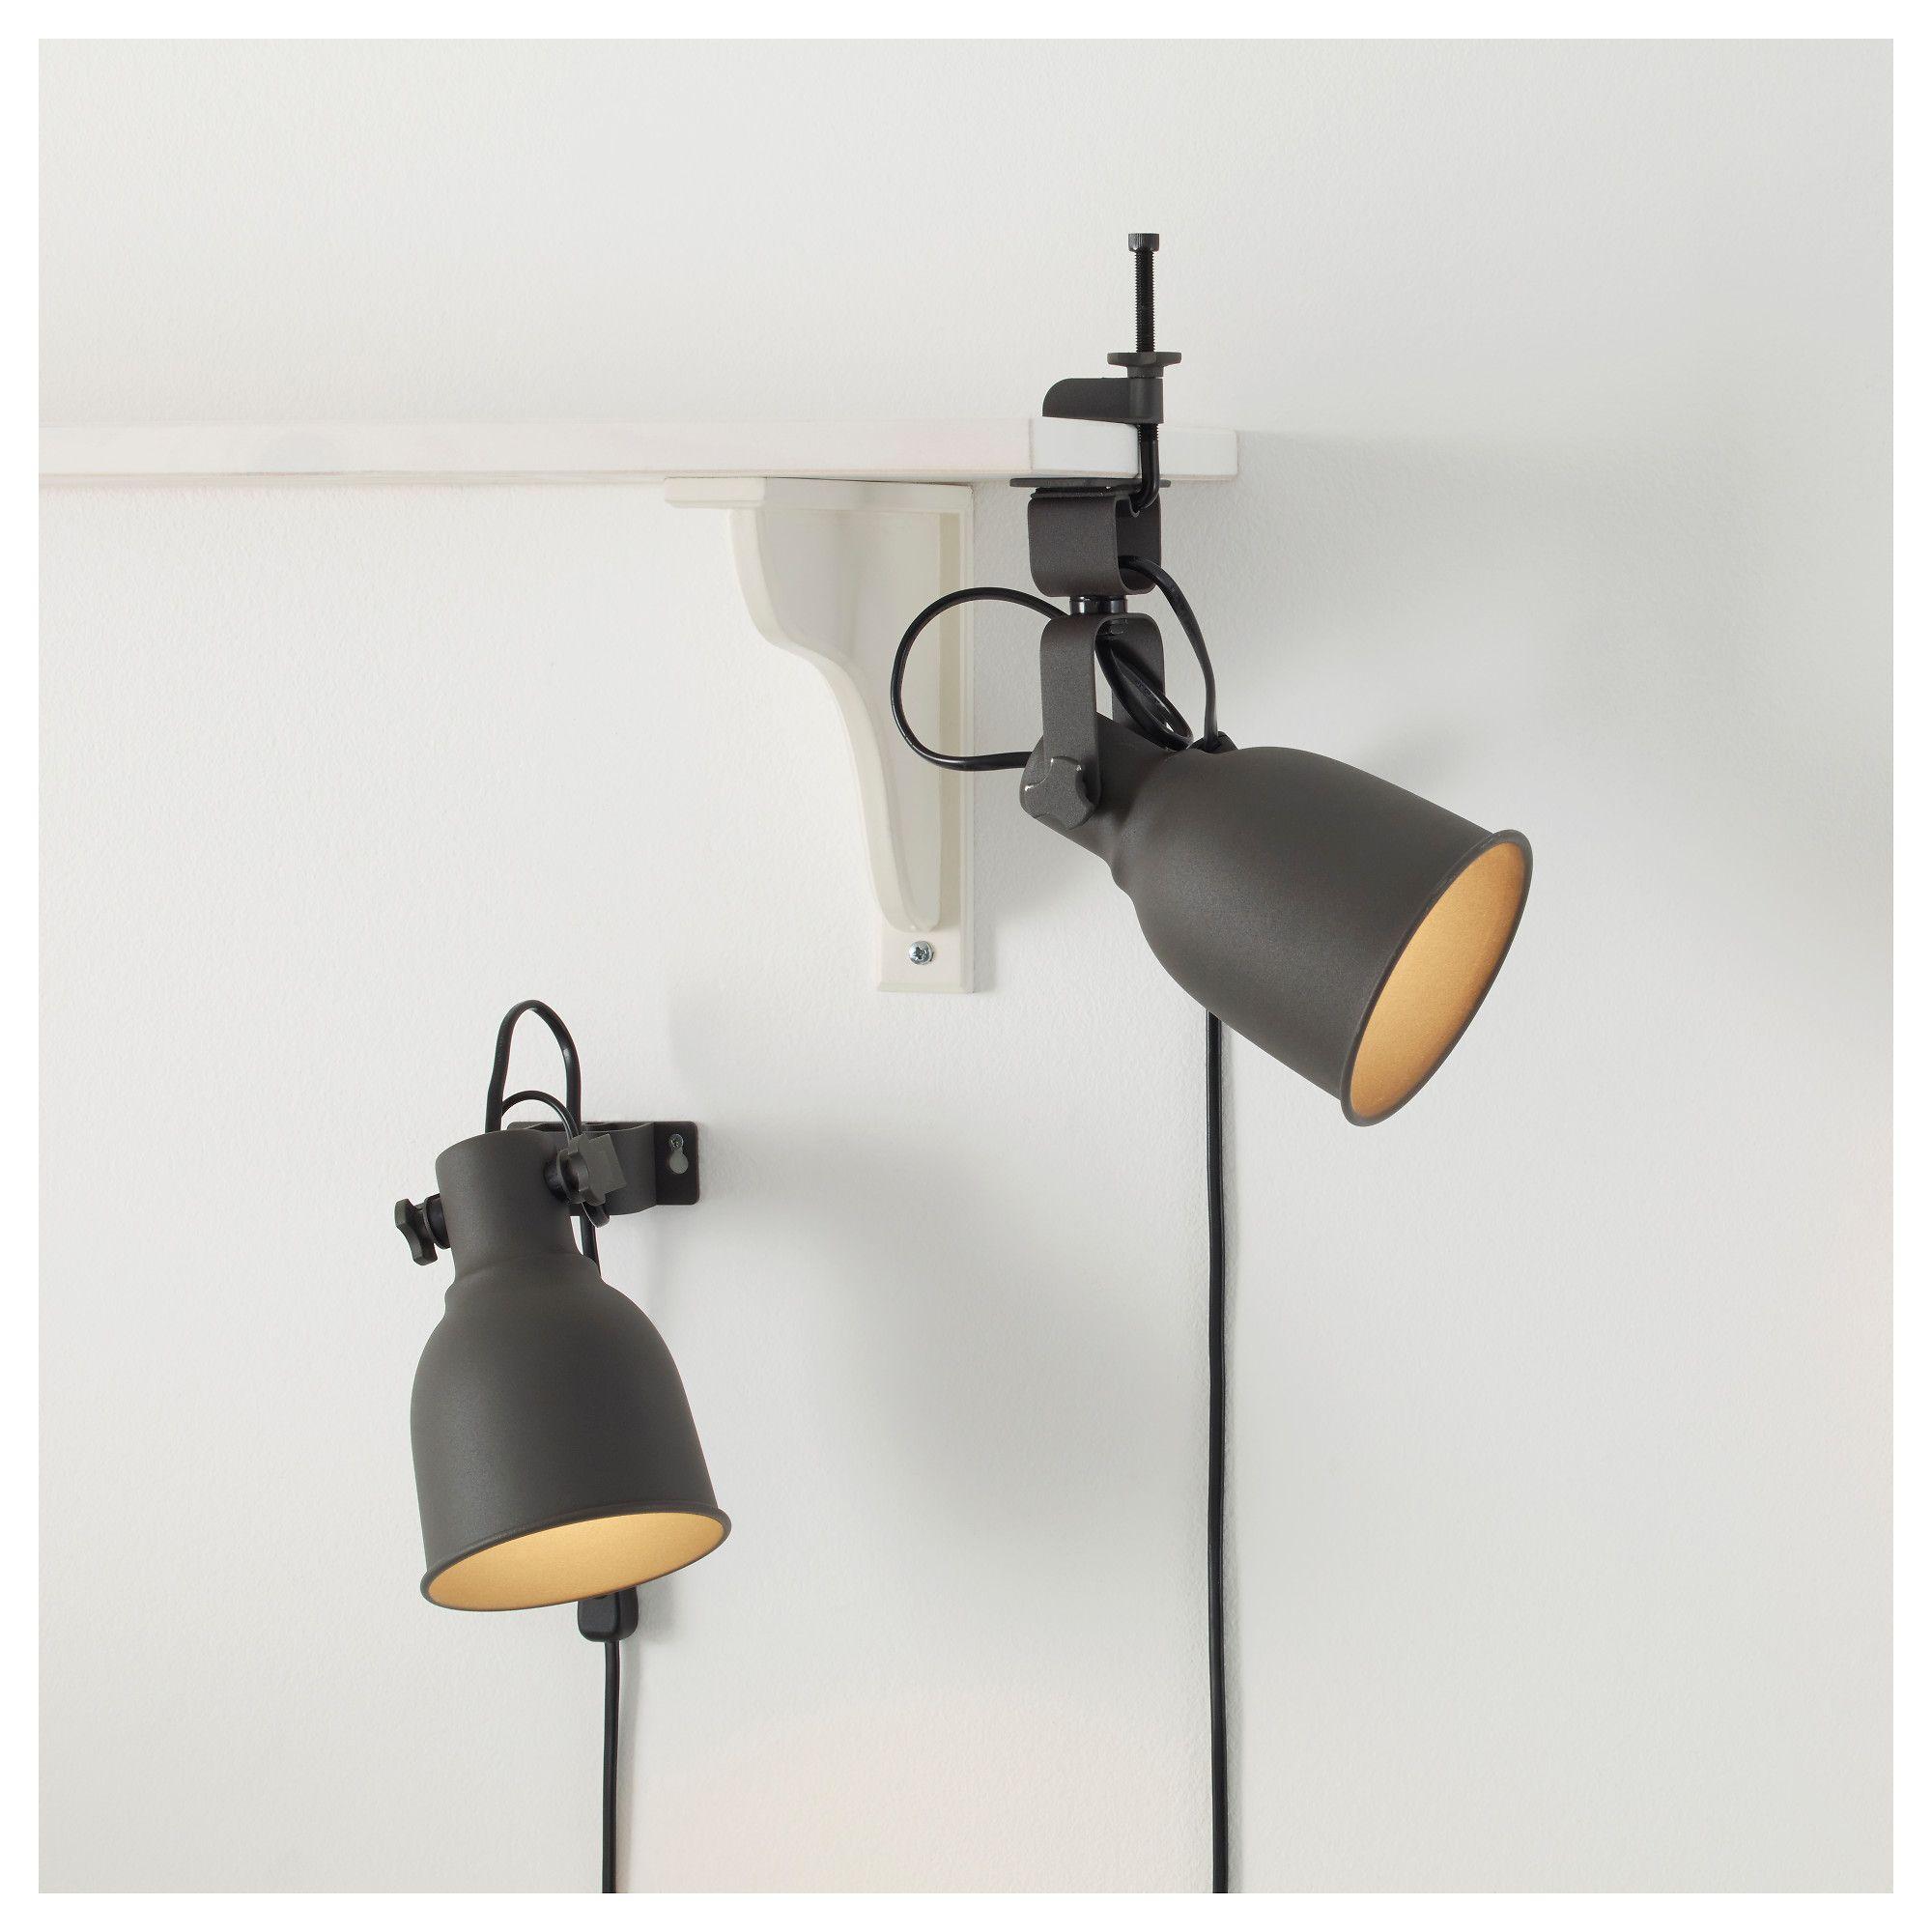 IKEA - HEKTAR Wall/clamp Spotlight Dark Gray